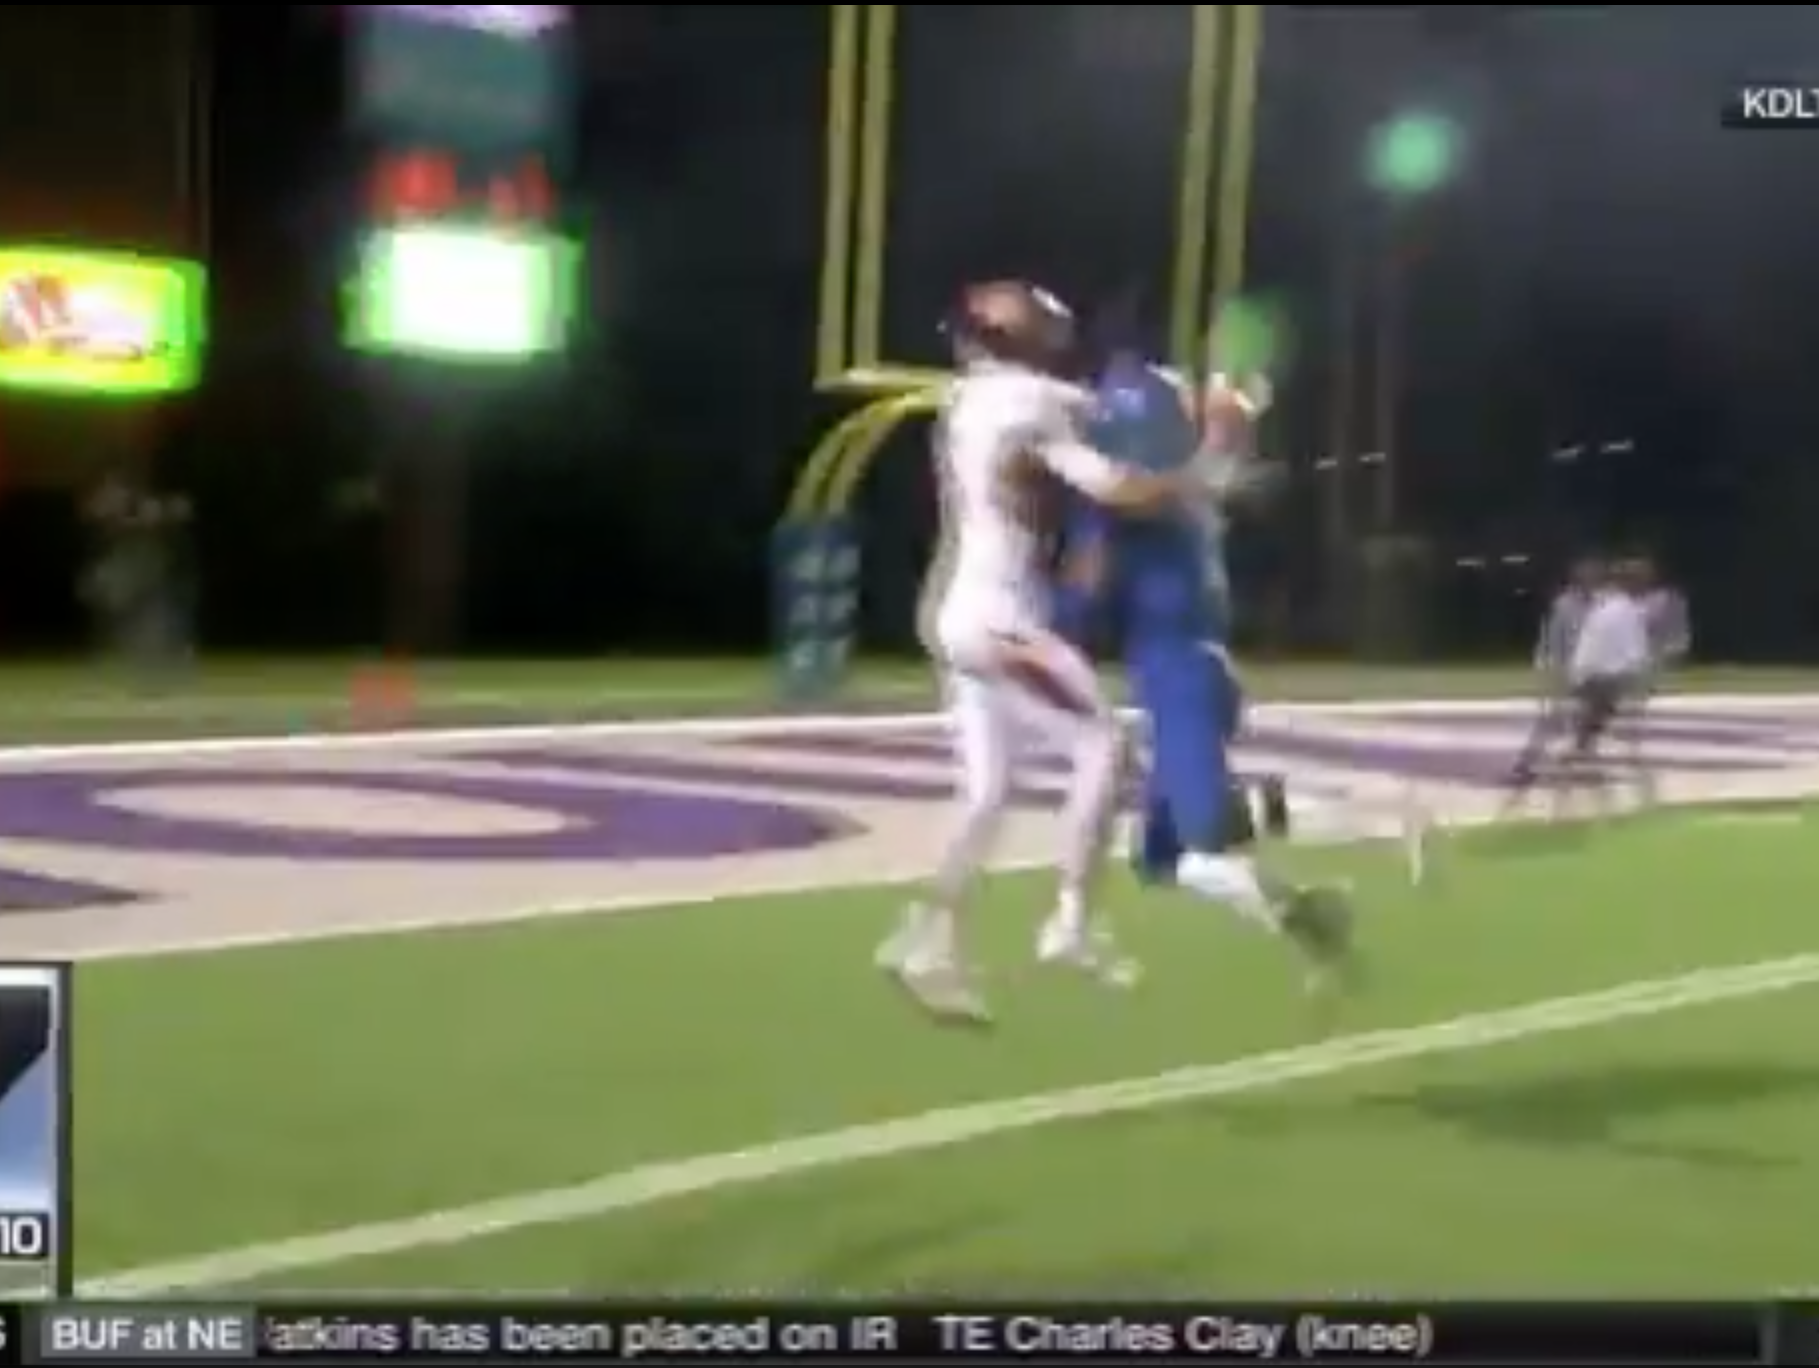 Madison's Jaxon Janke's ridiculous catch.